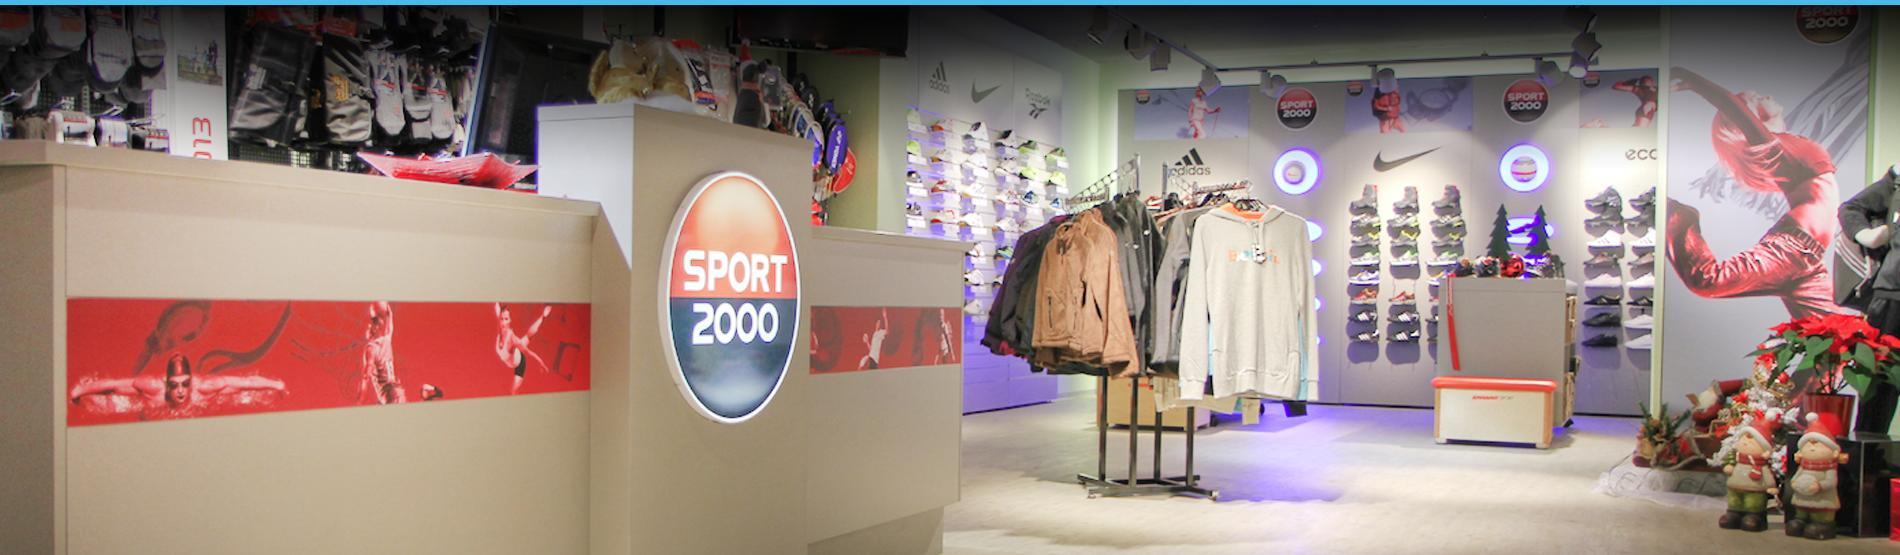 Kiosksystem Digitaler Ladentisch sport2000 titelbild